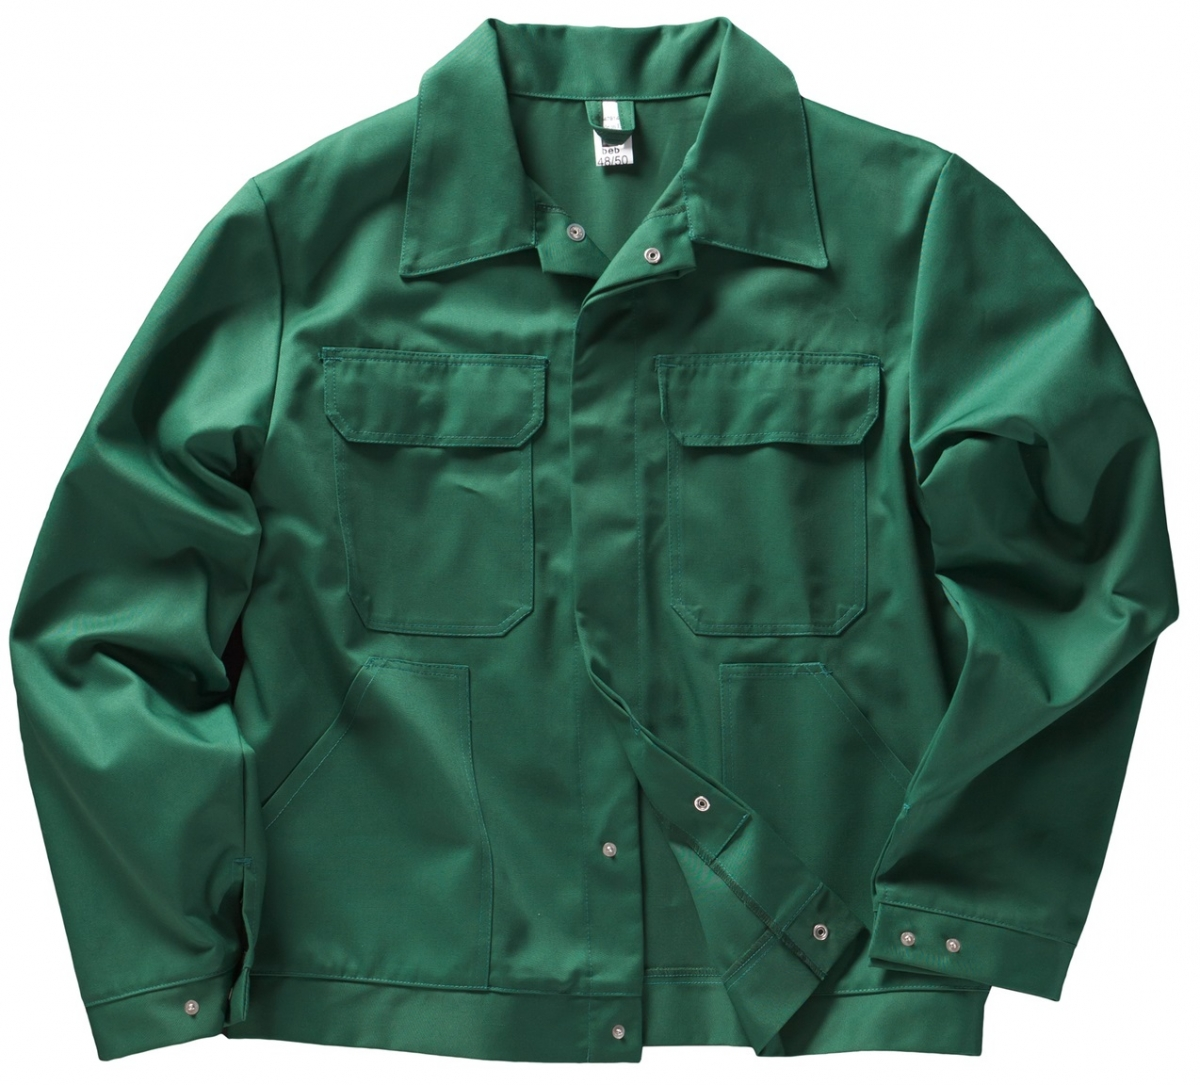 BEB-Arbeits-Berufs-Bund-Jacke, Basic, MG 245, grün